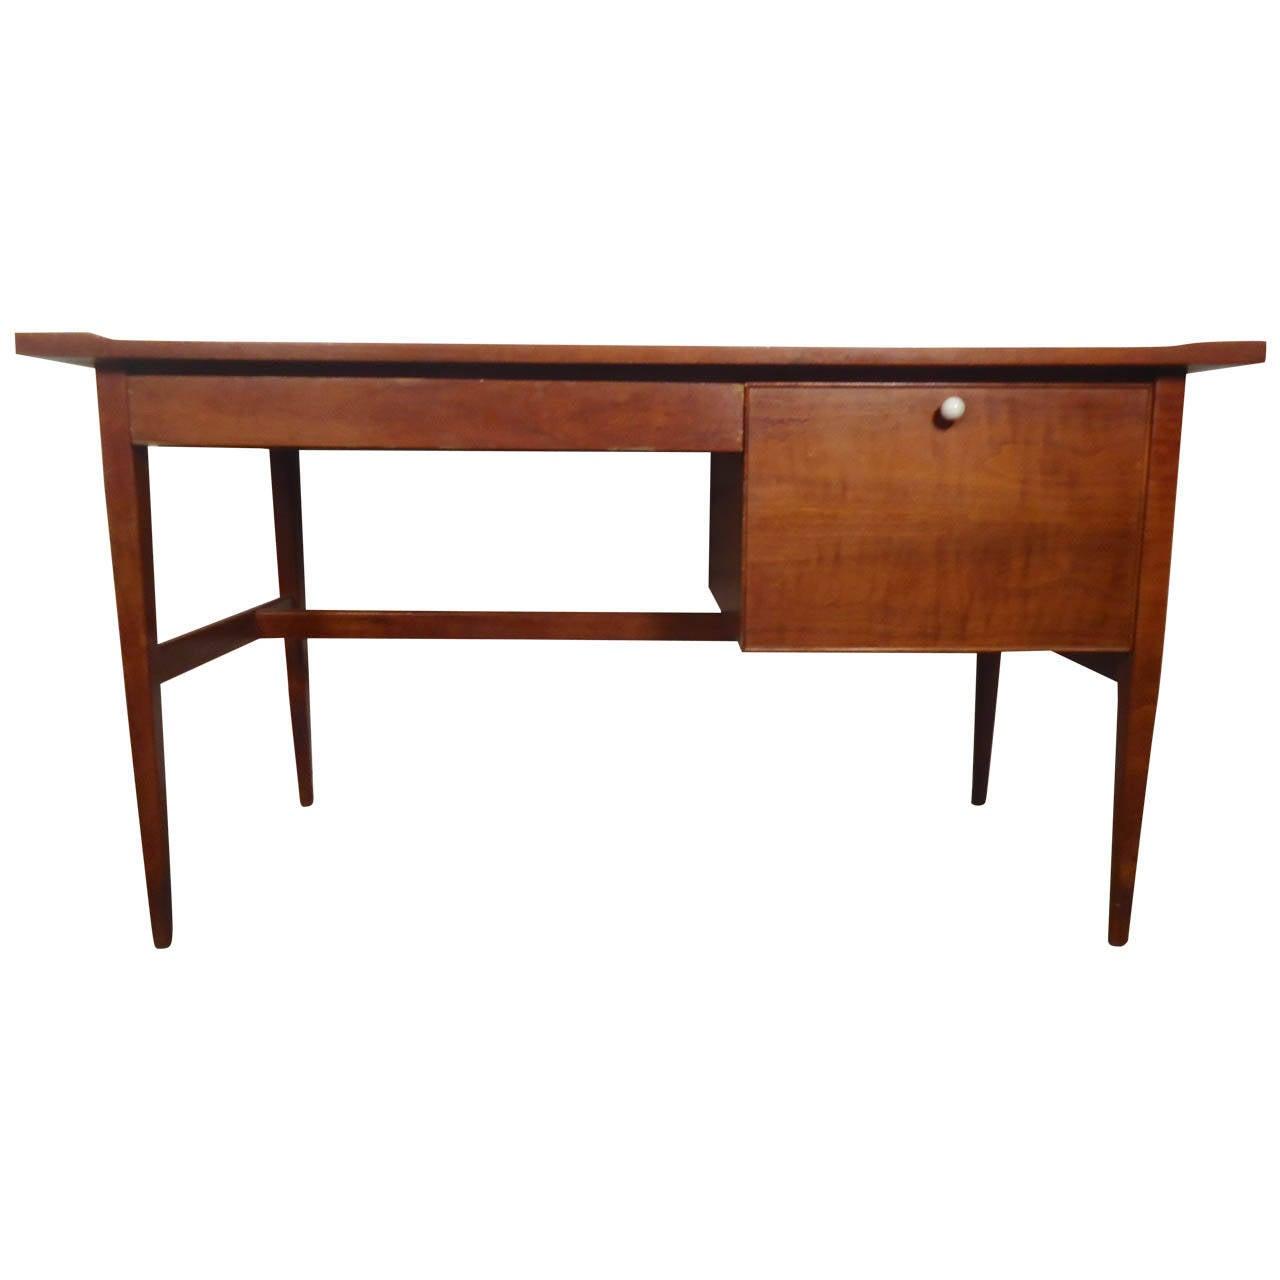 mid century modern desk chair bean bag baby drexel for sale at 1stdibs